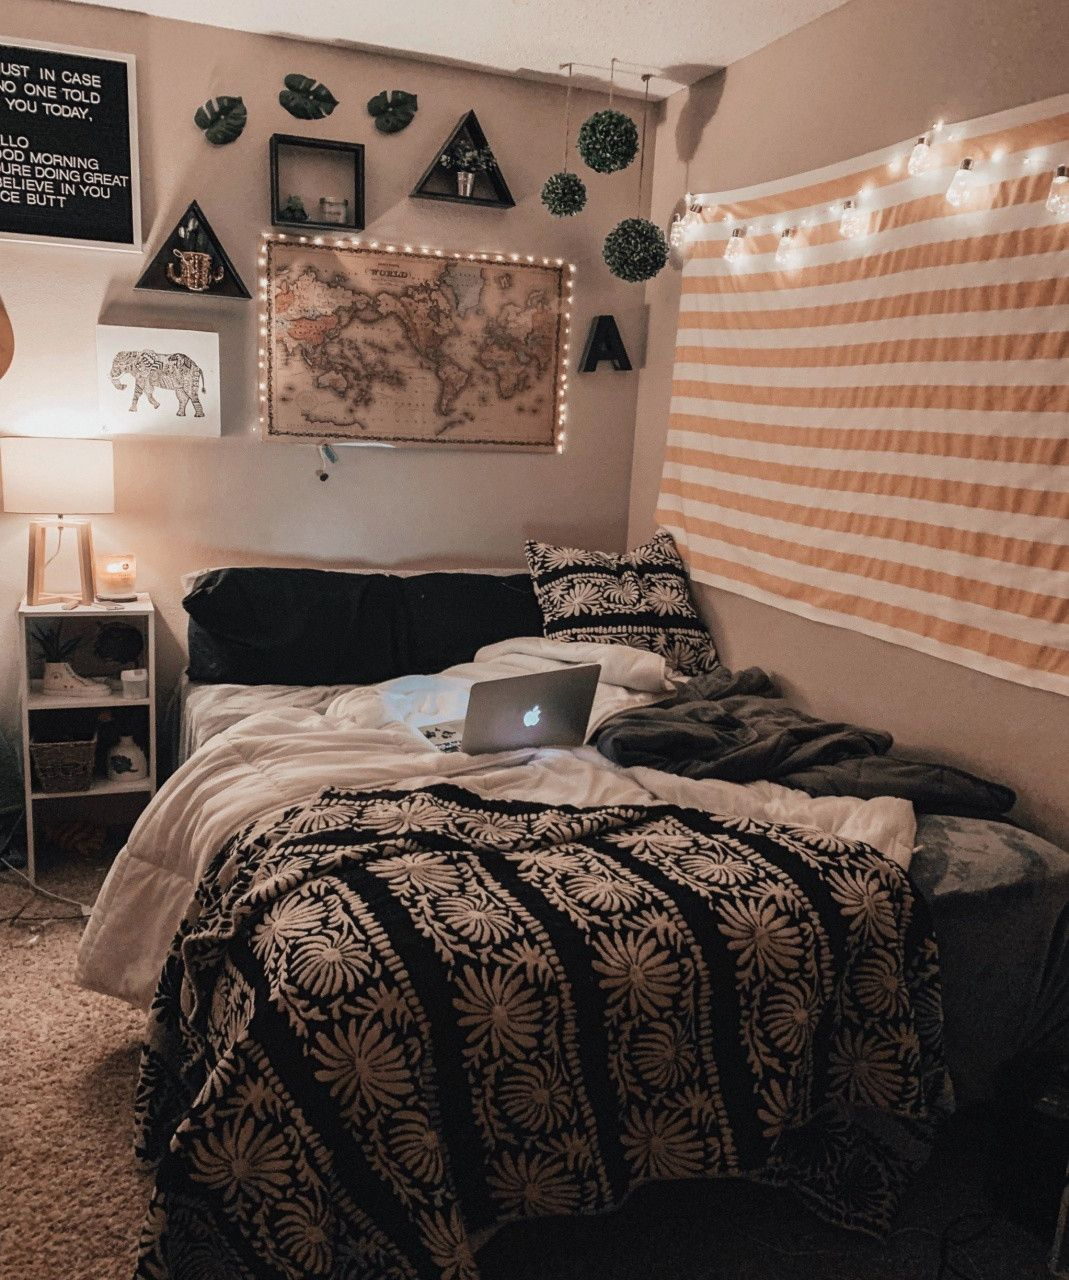 23 Black Furniture Bedroom Ideas For Girls In 2020 Cozy Dorm Room Bedroom Decor Dorm Room Decor